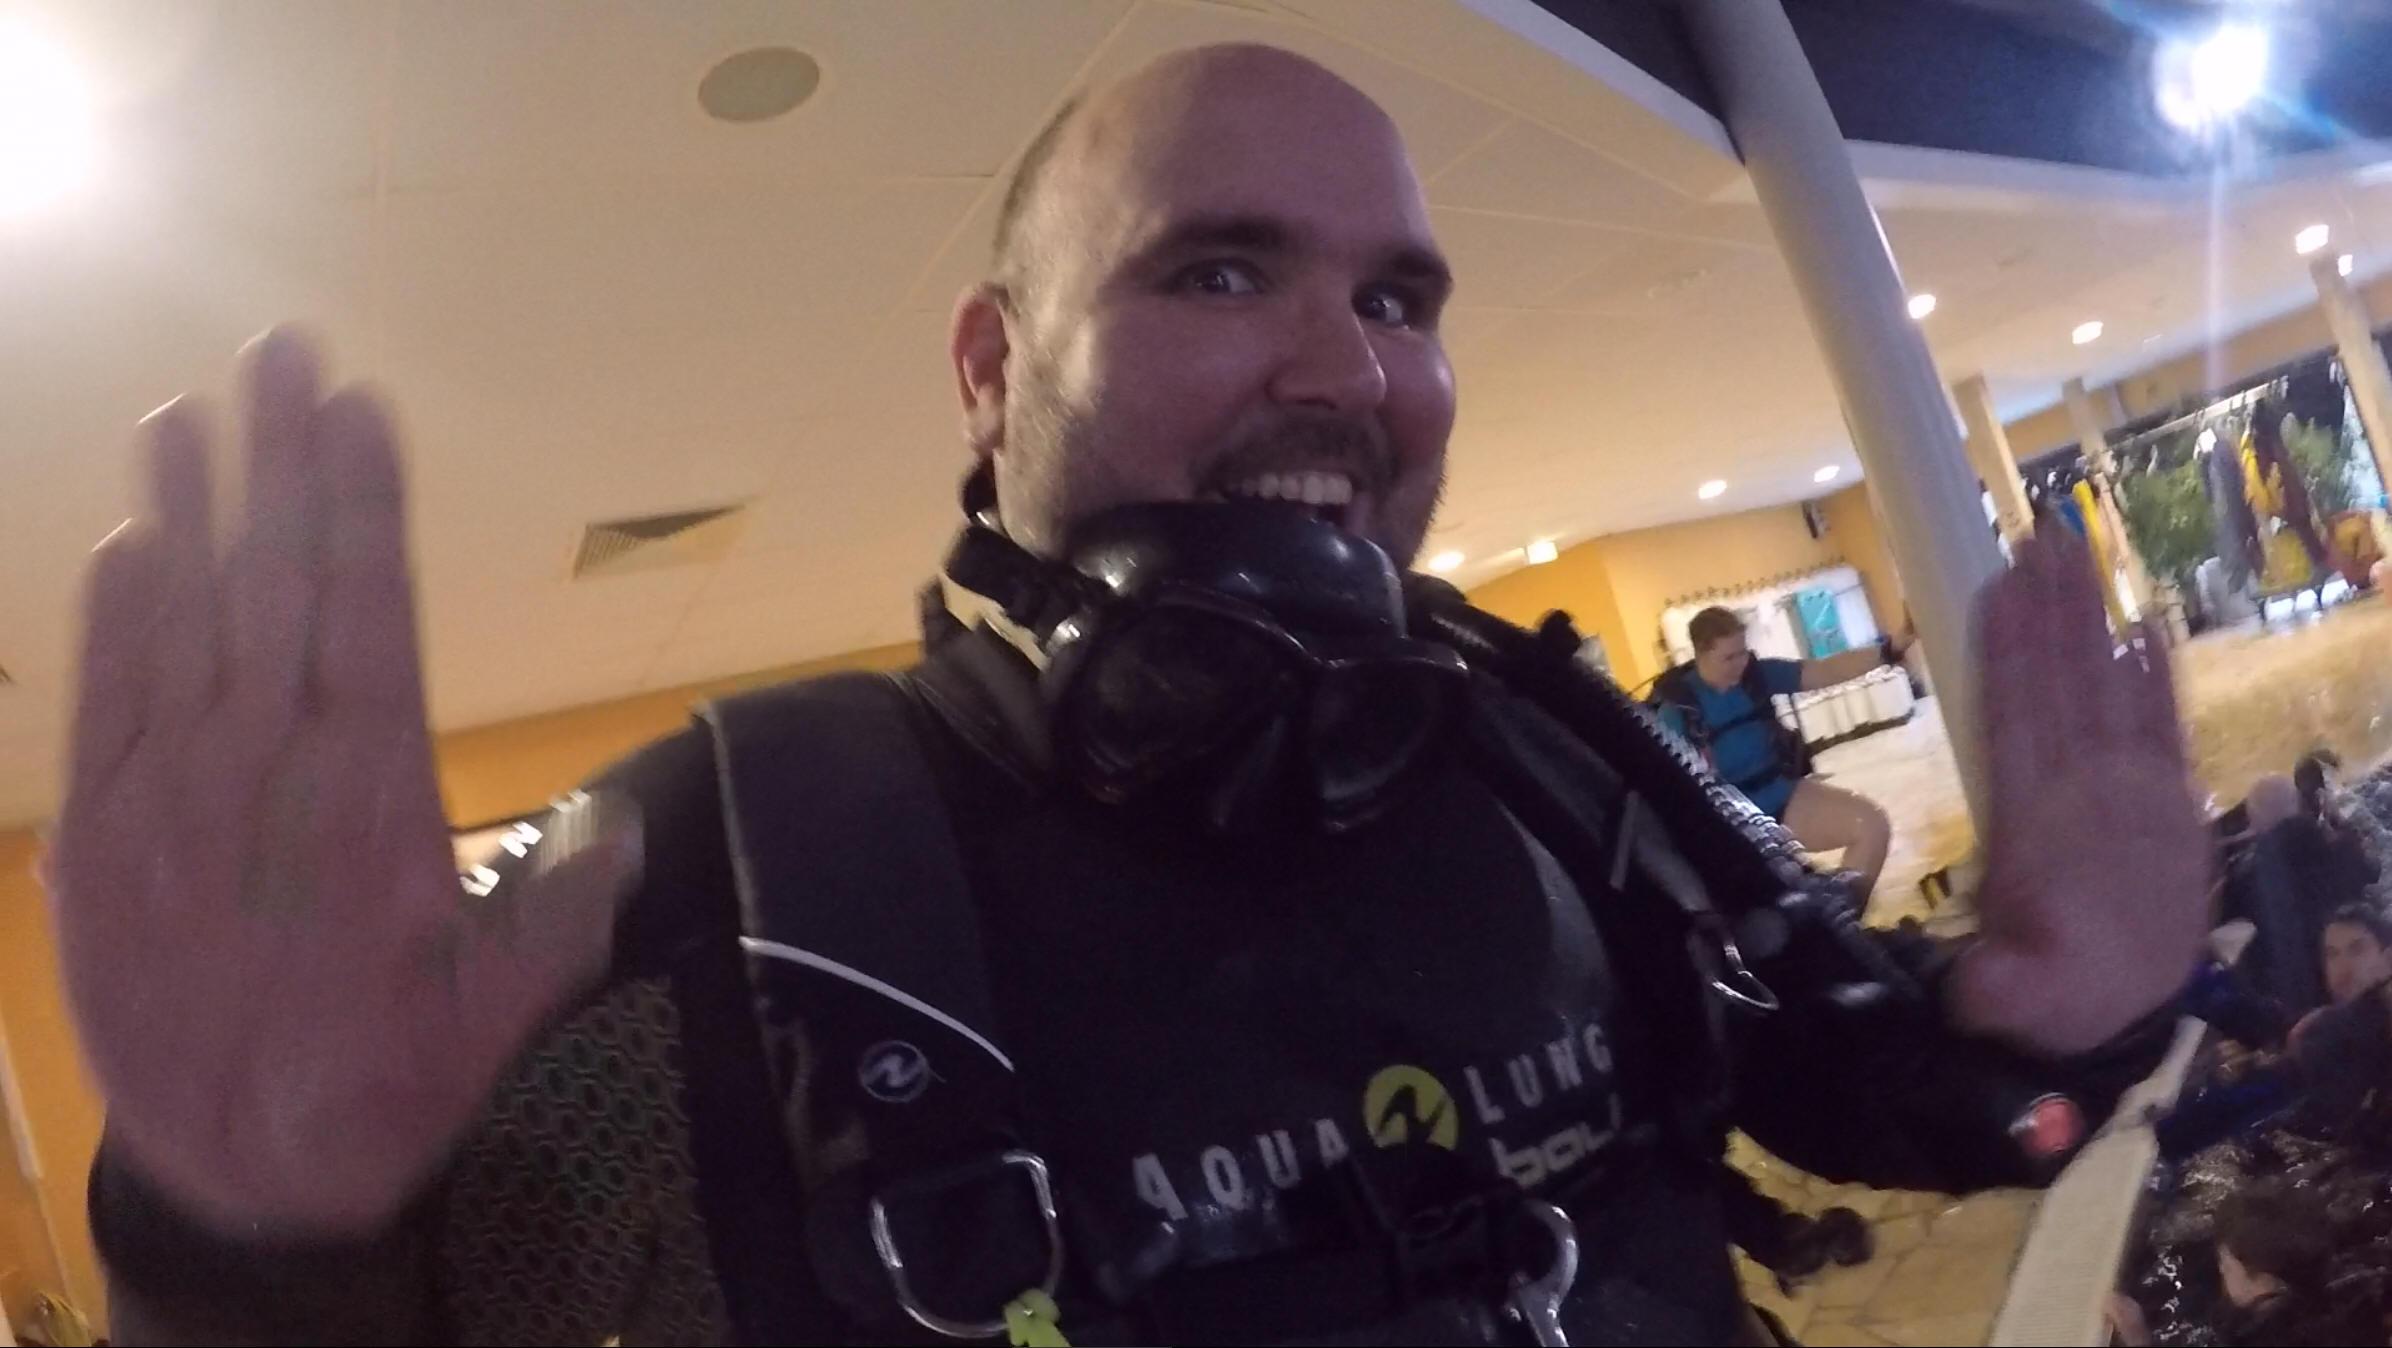 201801_CPS_Sortie Fosse Dive4Life_012